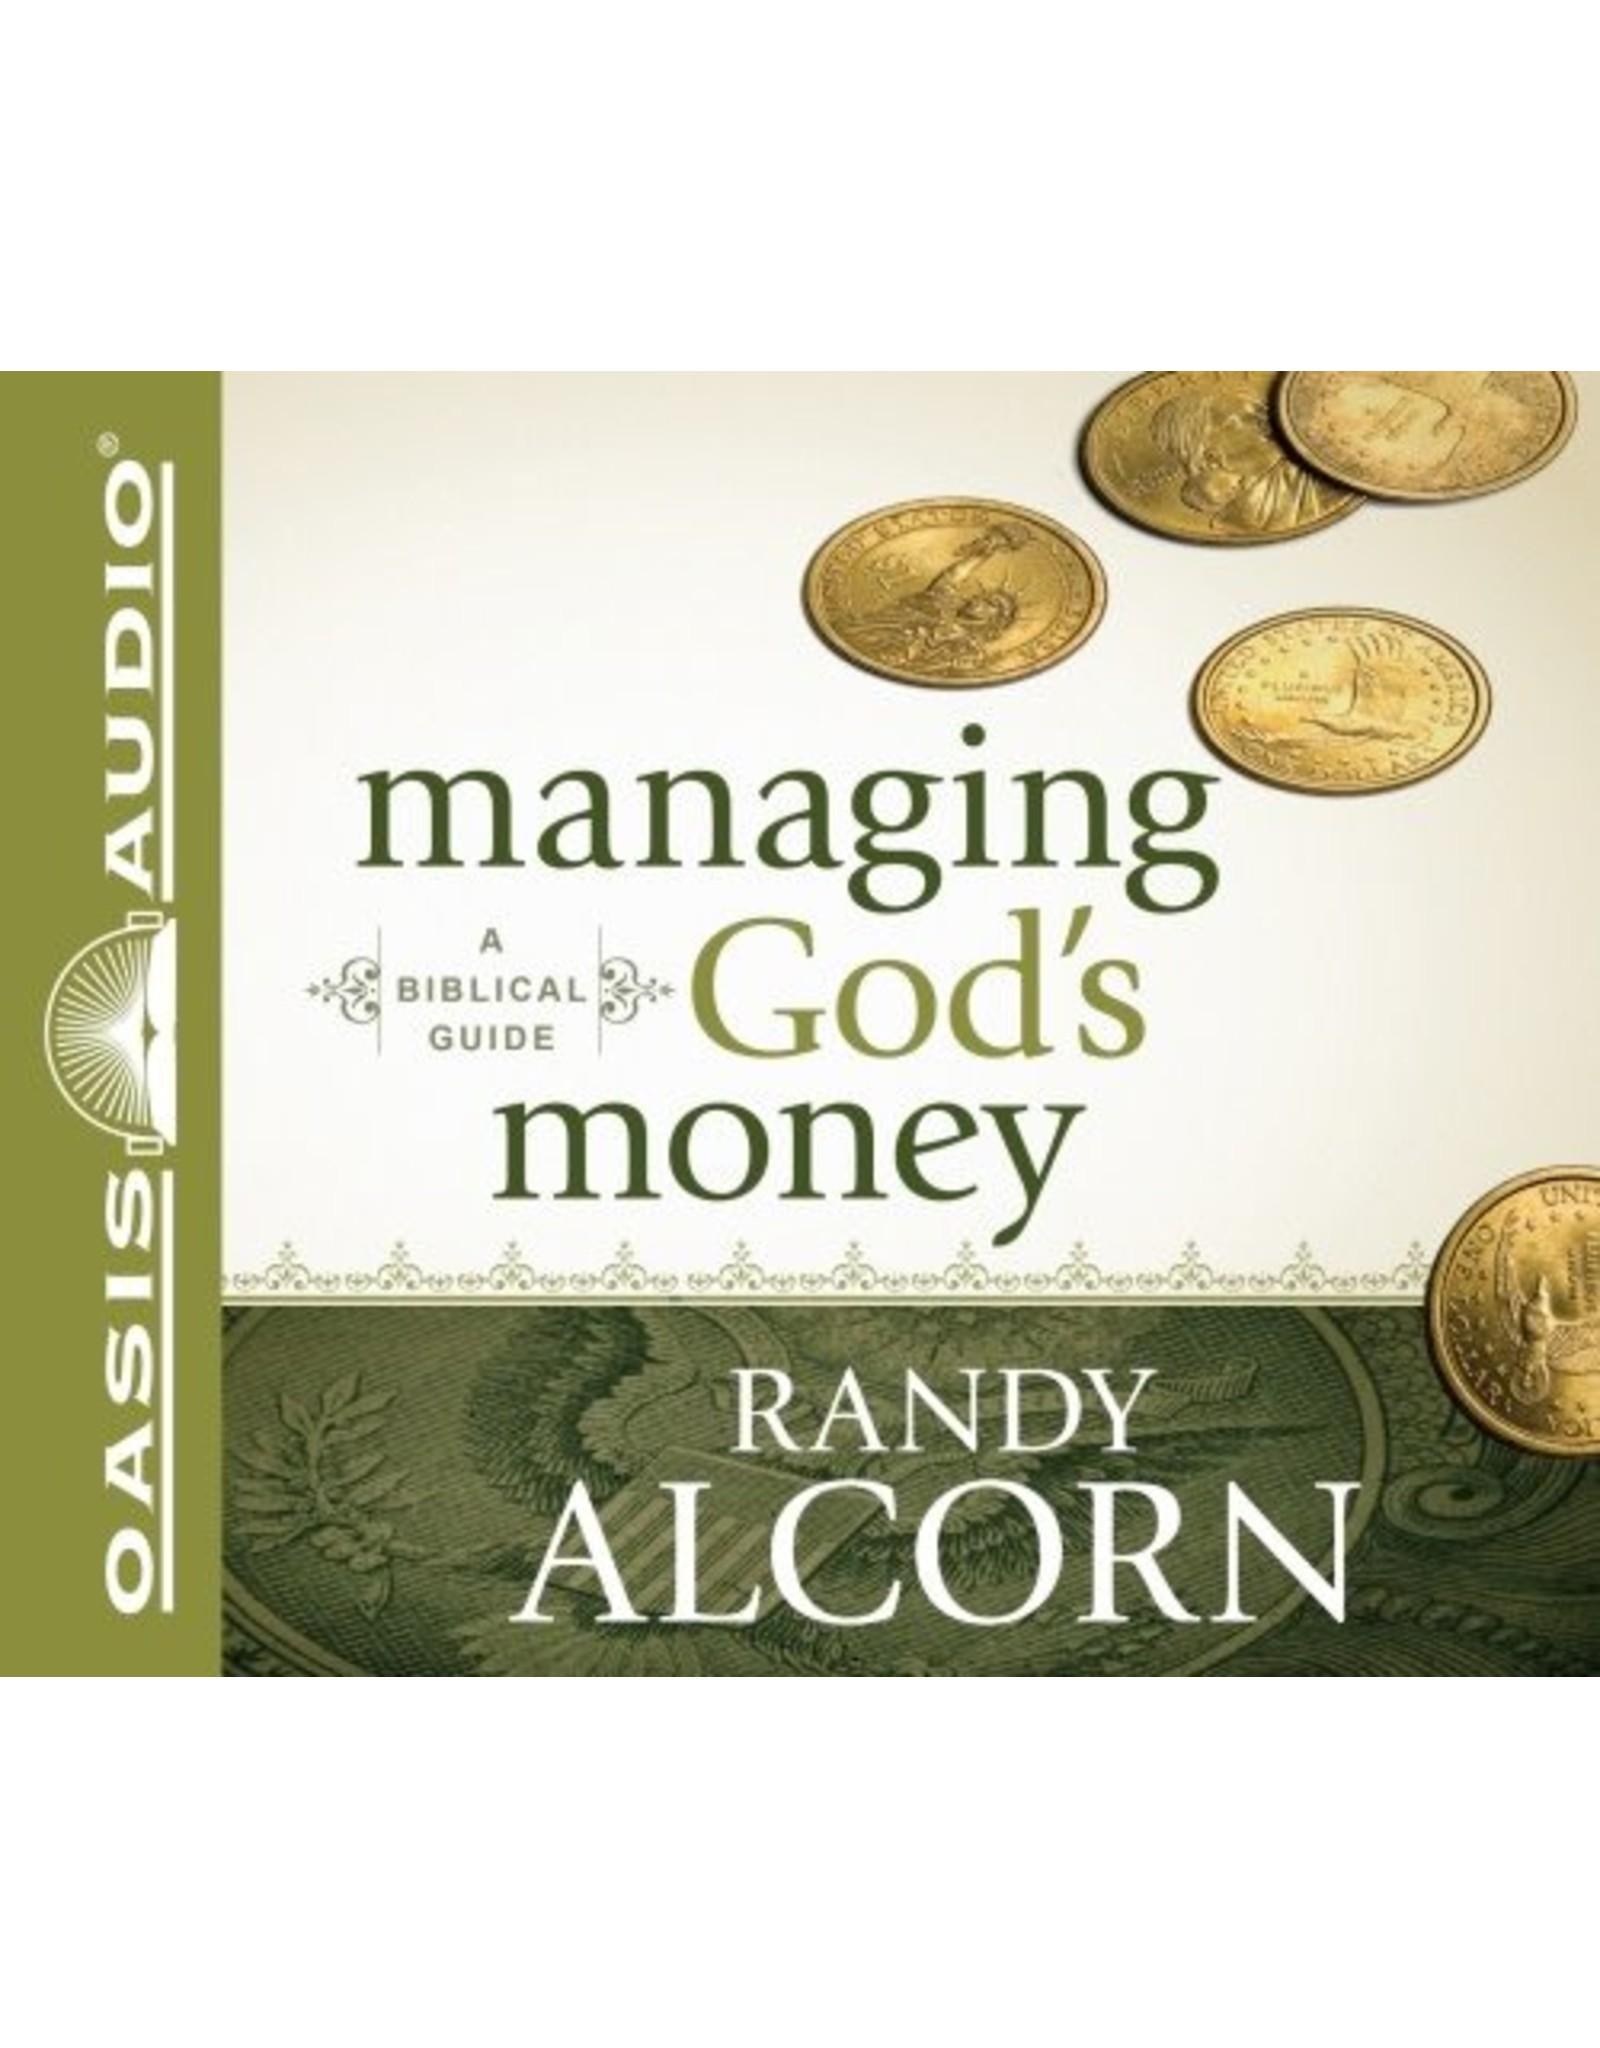 Oasis Managing God's Money: A Biblical Guide (Audio CD)